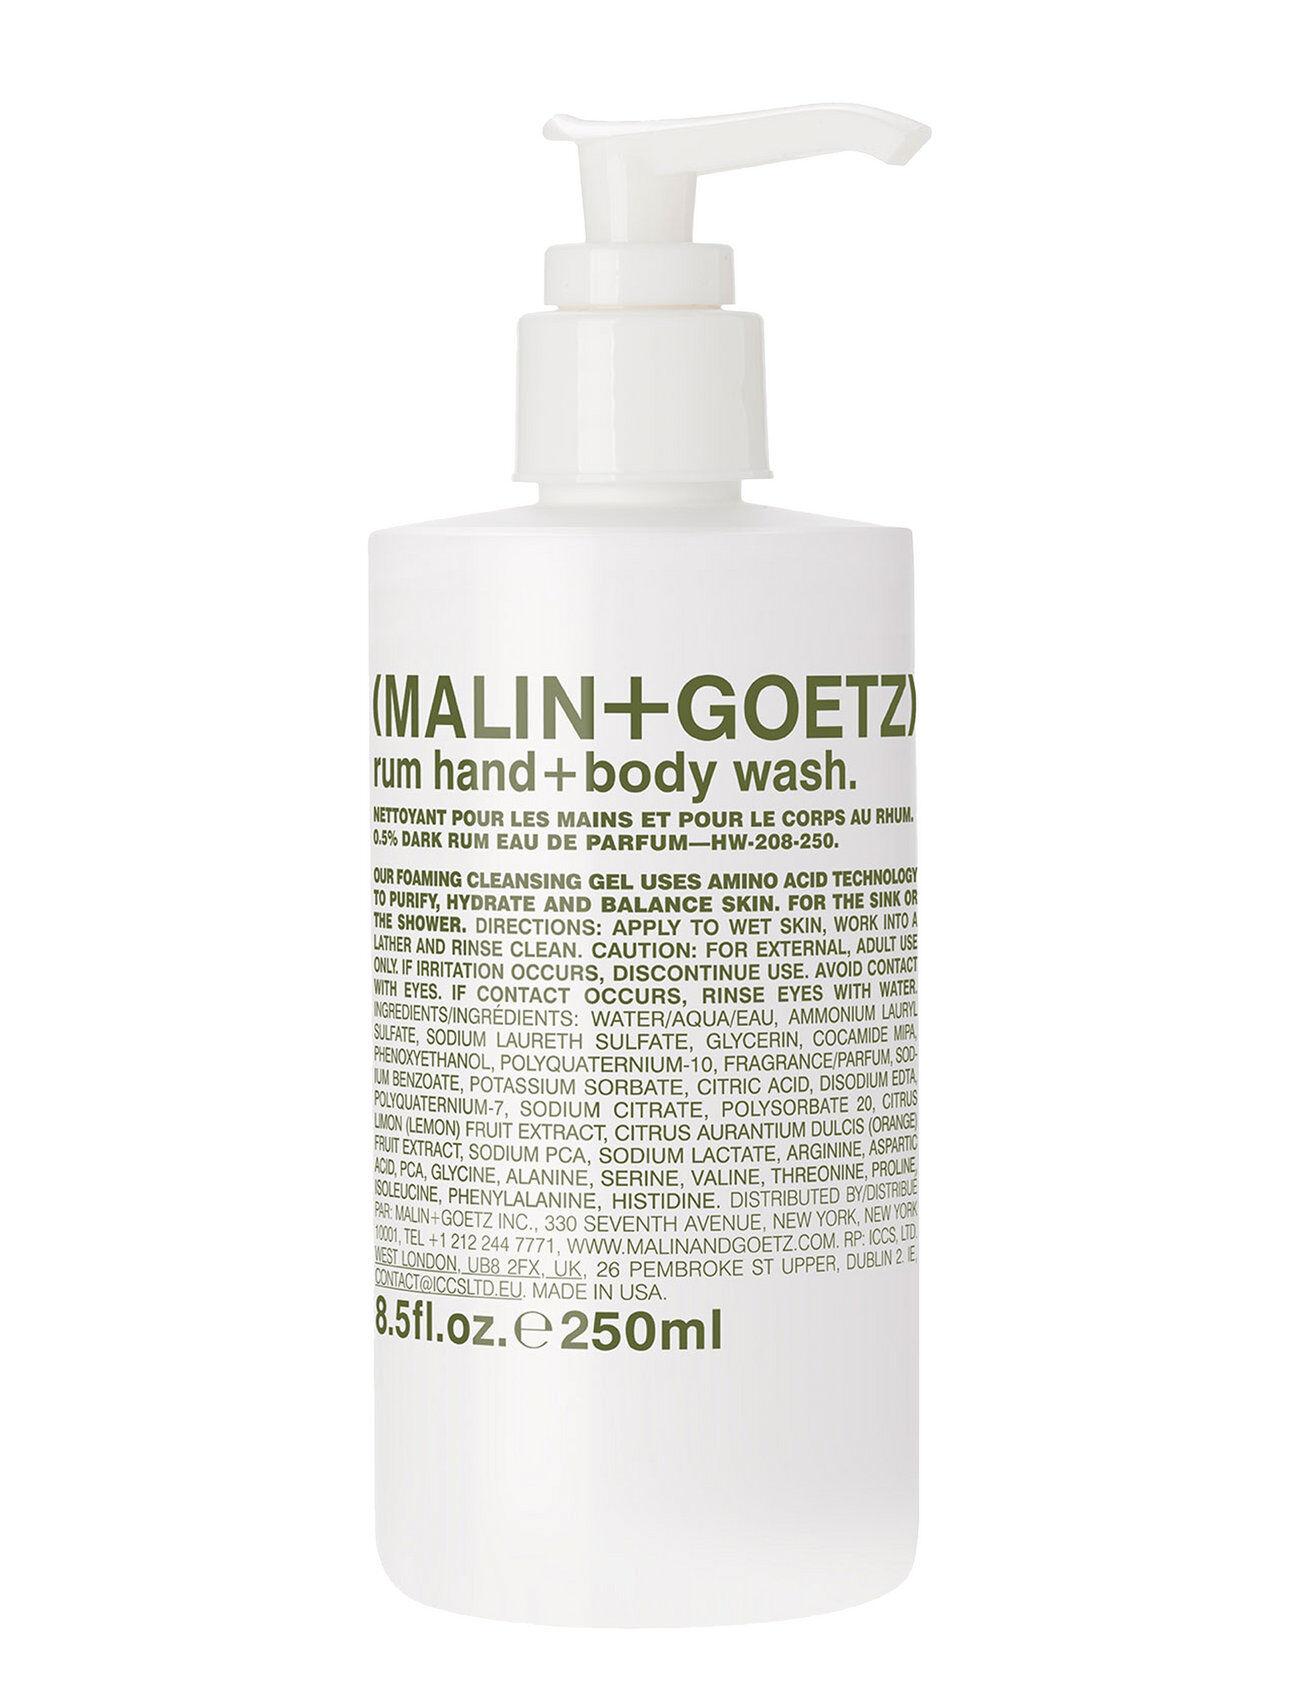 MALIN+GOETZ Rum Hand + Body Wash Suihkugeeli Nude MALIN+GOETZ